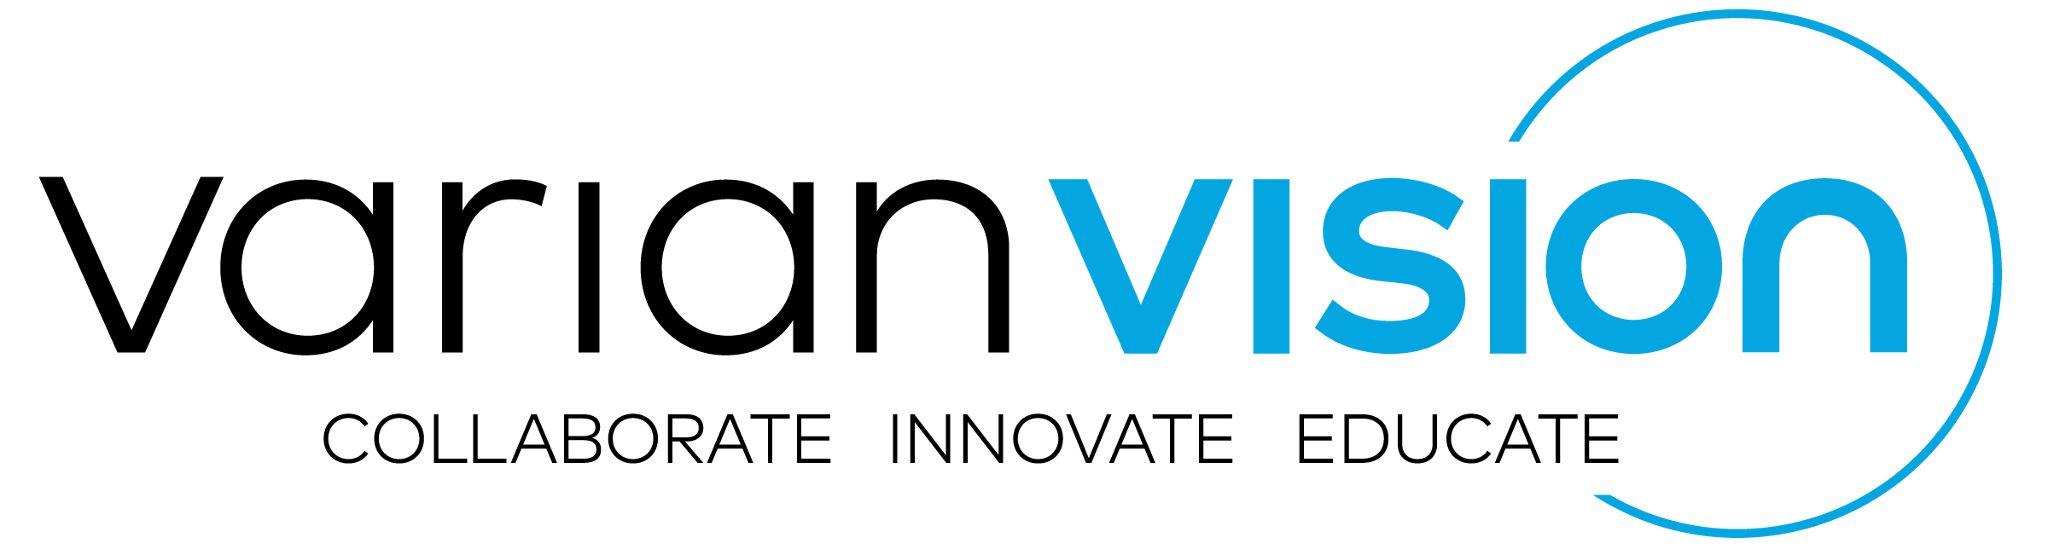 VarianVisionCIE_logo